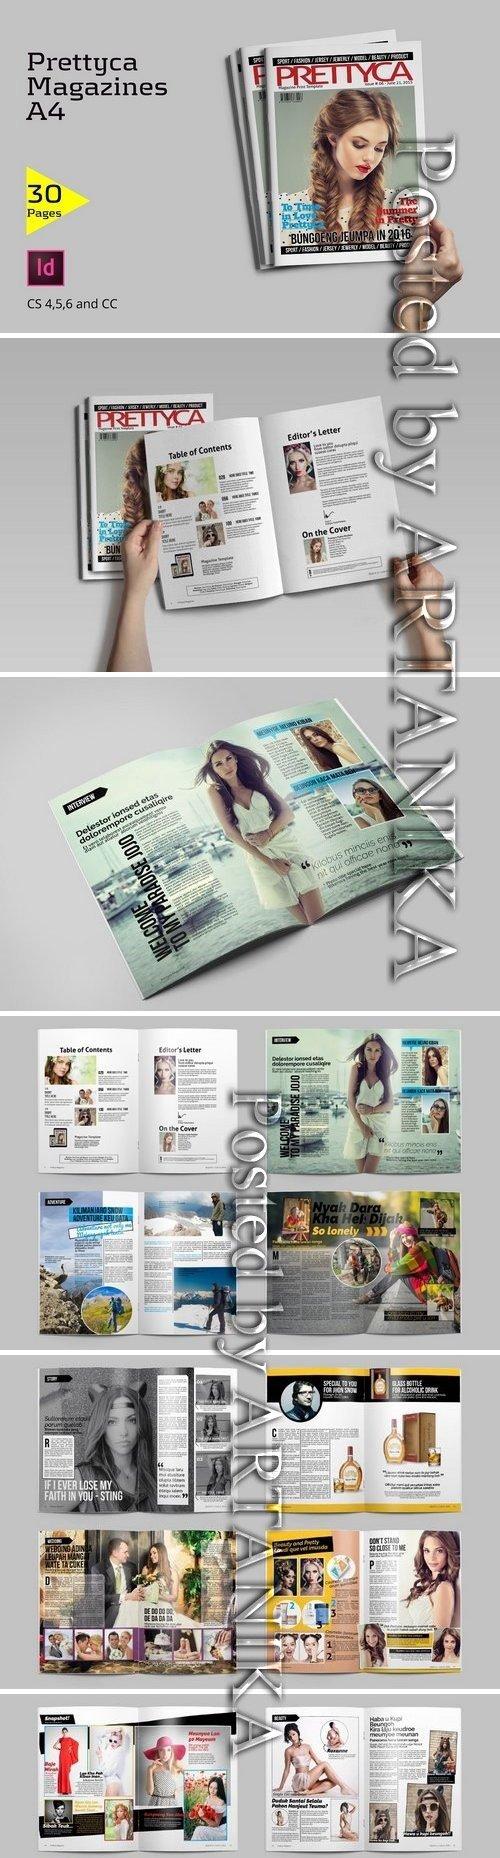 CM - Prettyca Magazines 501276